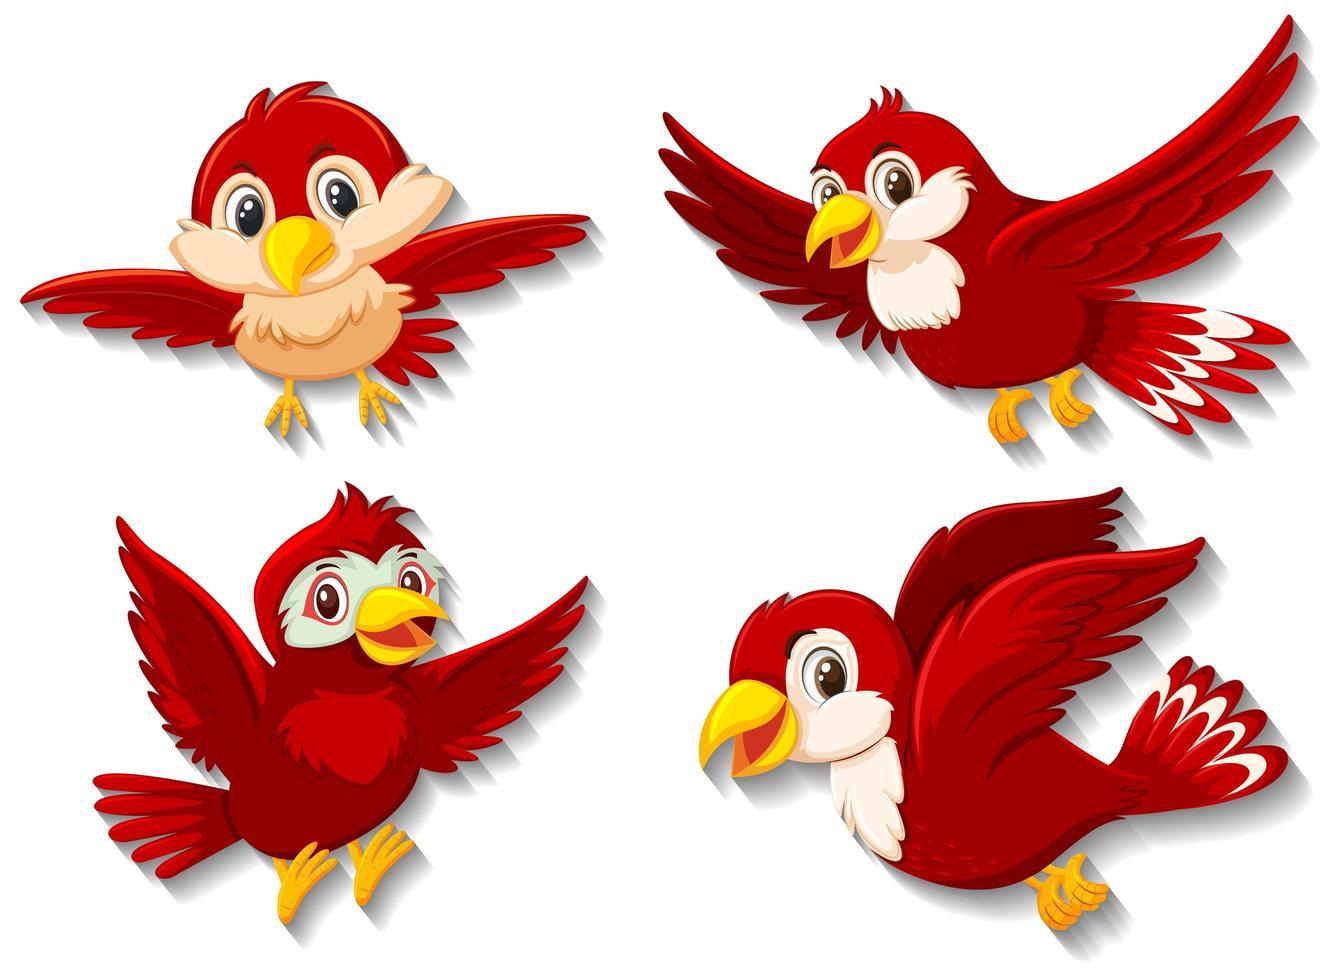 rode vogel stripfiguur vector